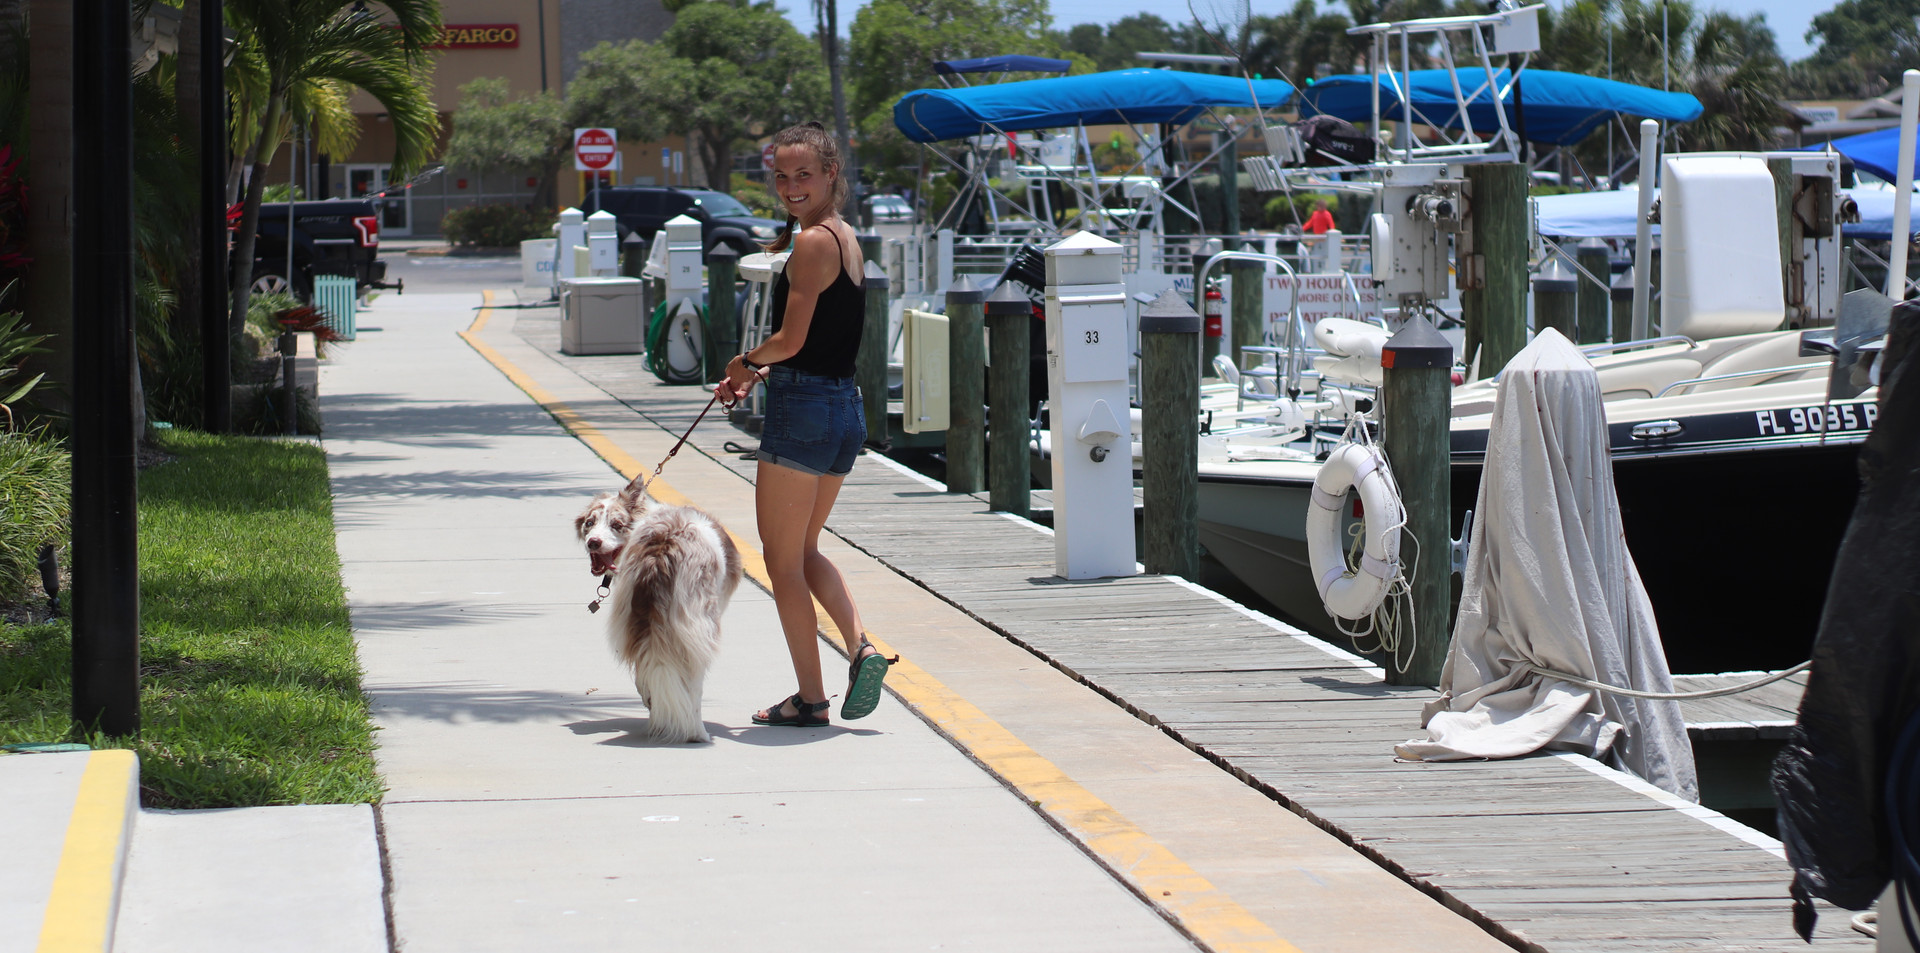 Casper with Mac at dock.JPG